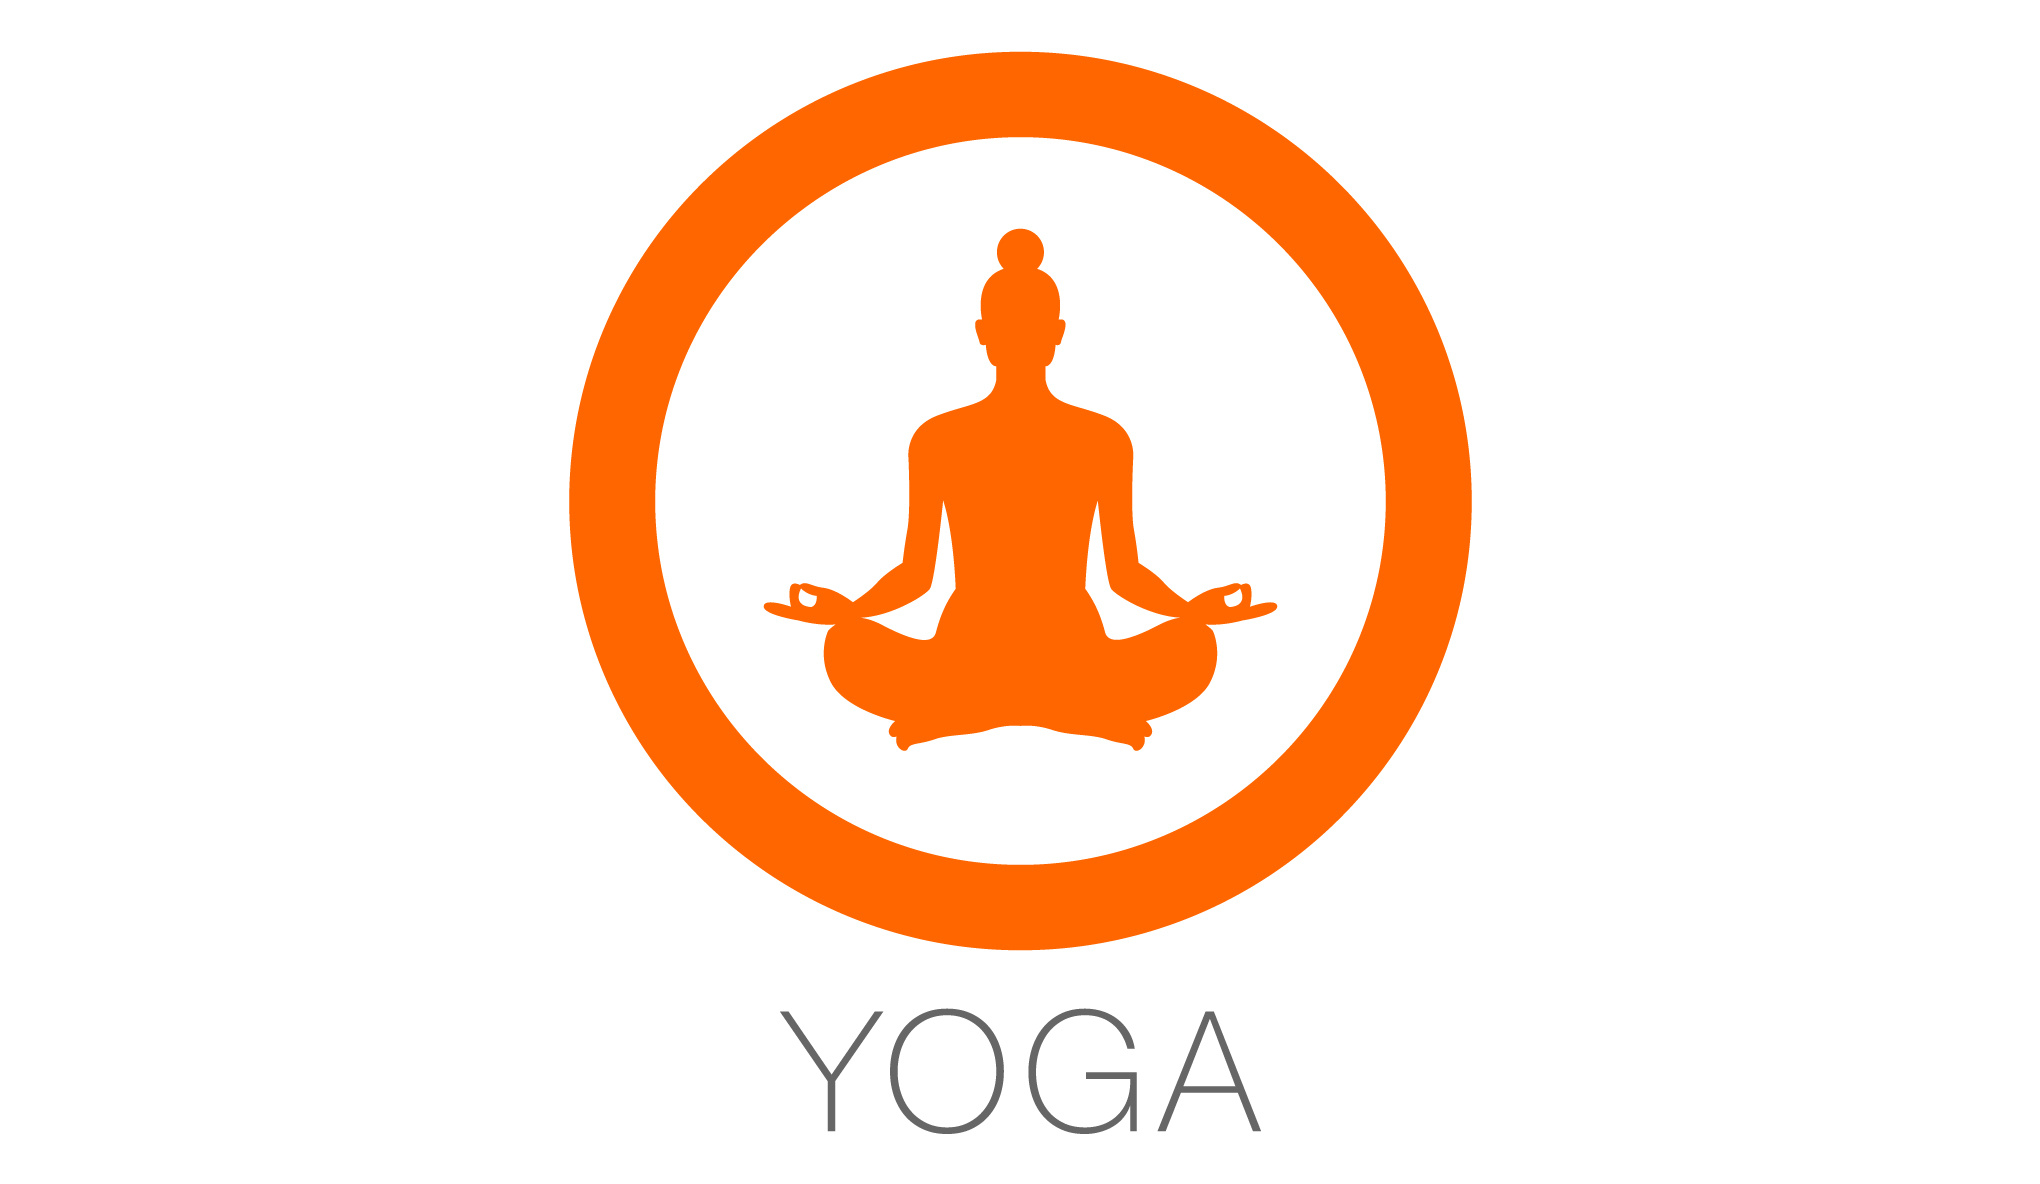 https://0201.nccdn.net/1_2/000/000/12a/830/yoga-2040x1184.jpg